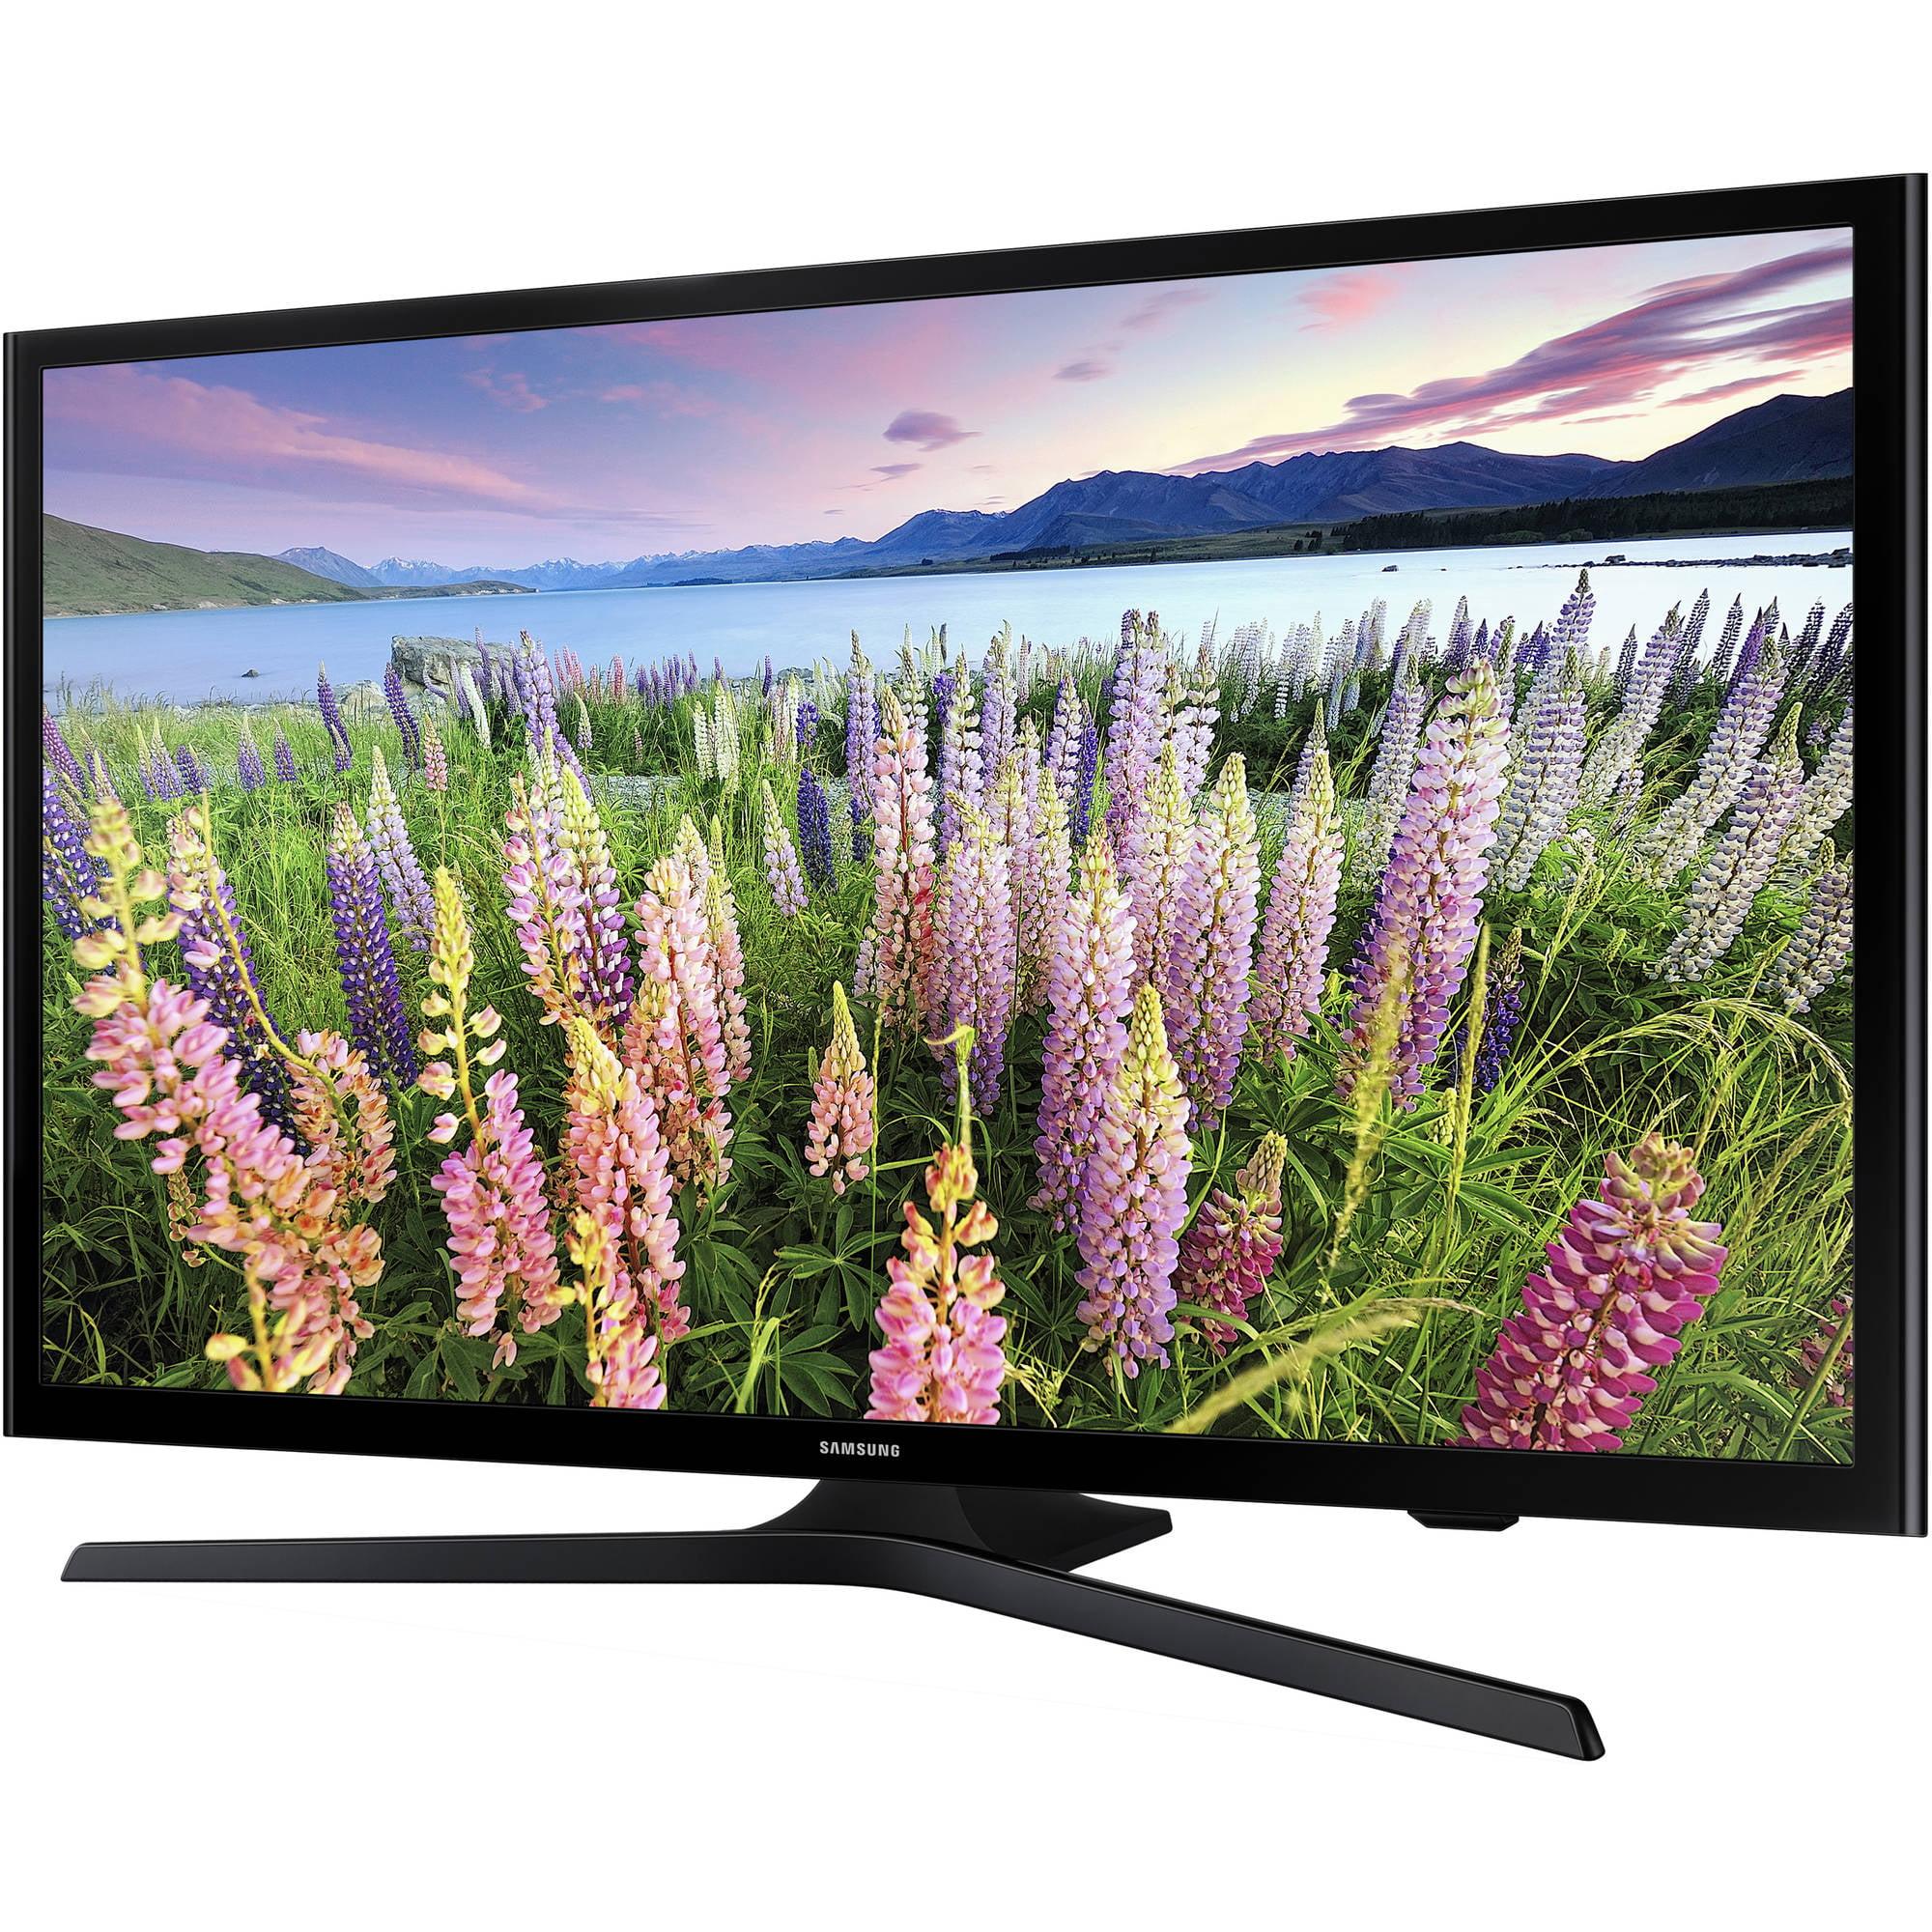 "Samsung UN50J5200AFXZA 50"" 1080p 60Hz LED HDTV"